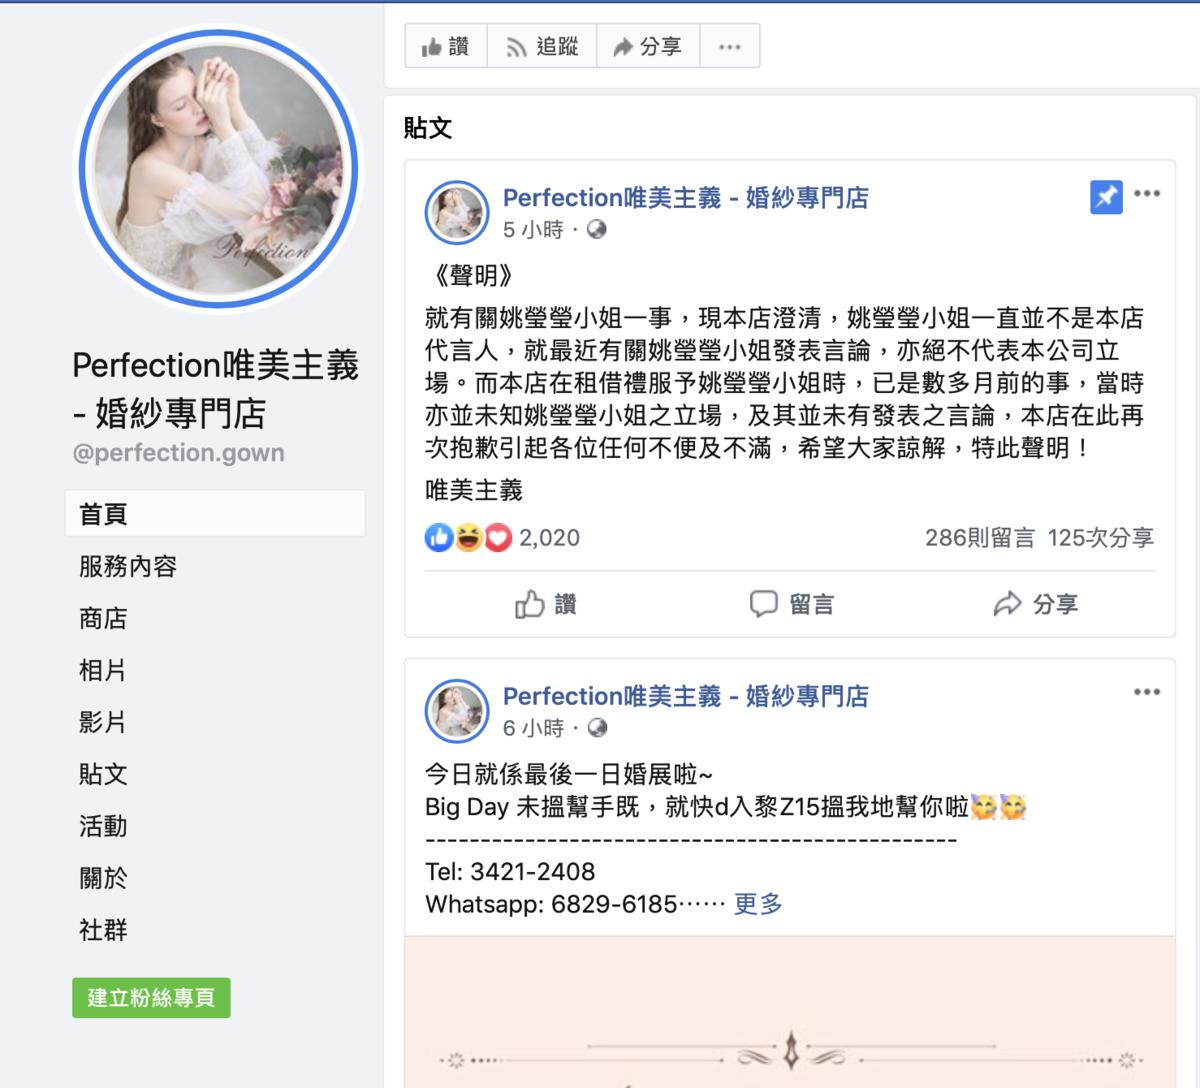 Perfection唯美主義-婚紗專門店臉書(截圖)